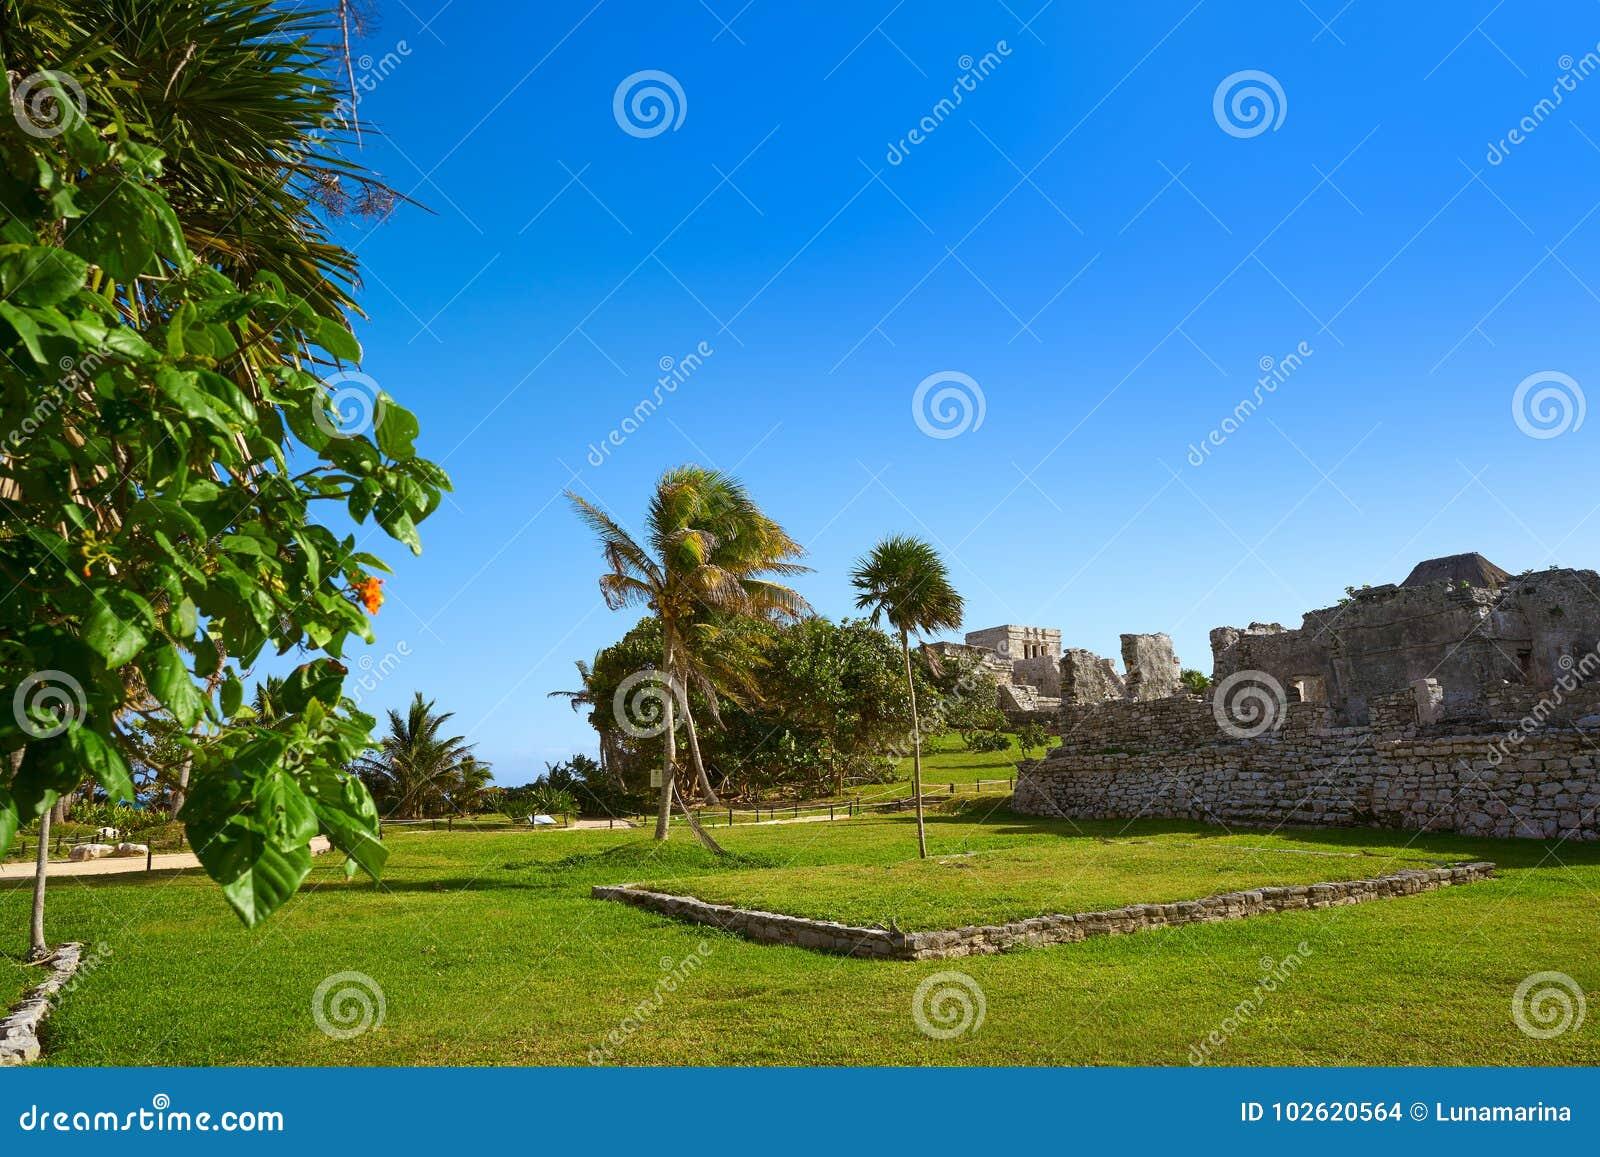 Tulum Mayan city ruins in Riviera Maya